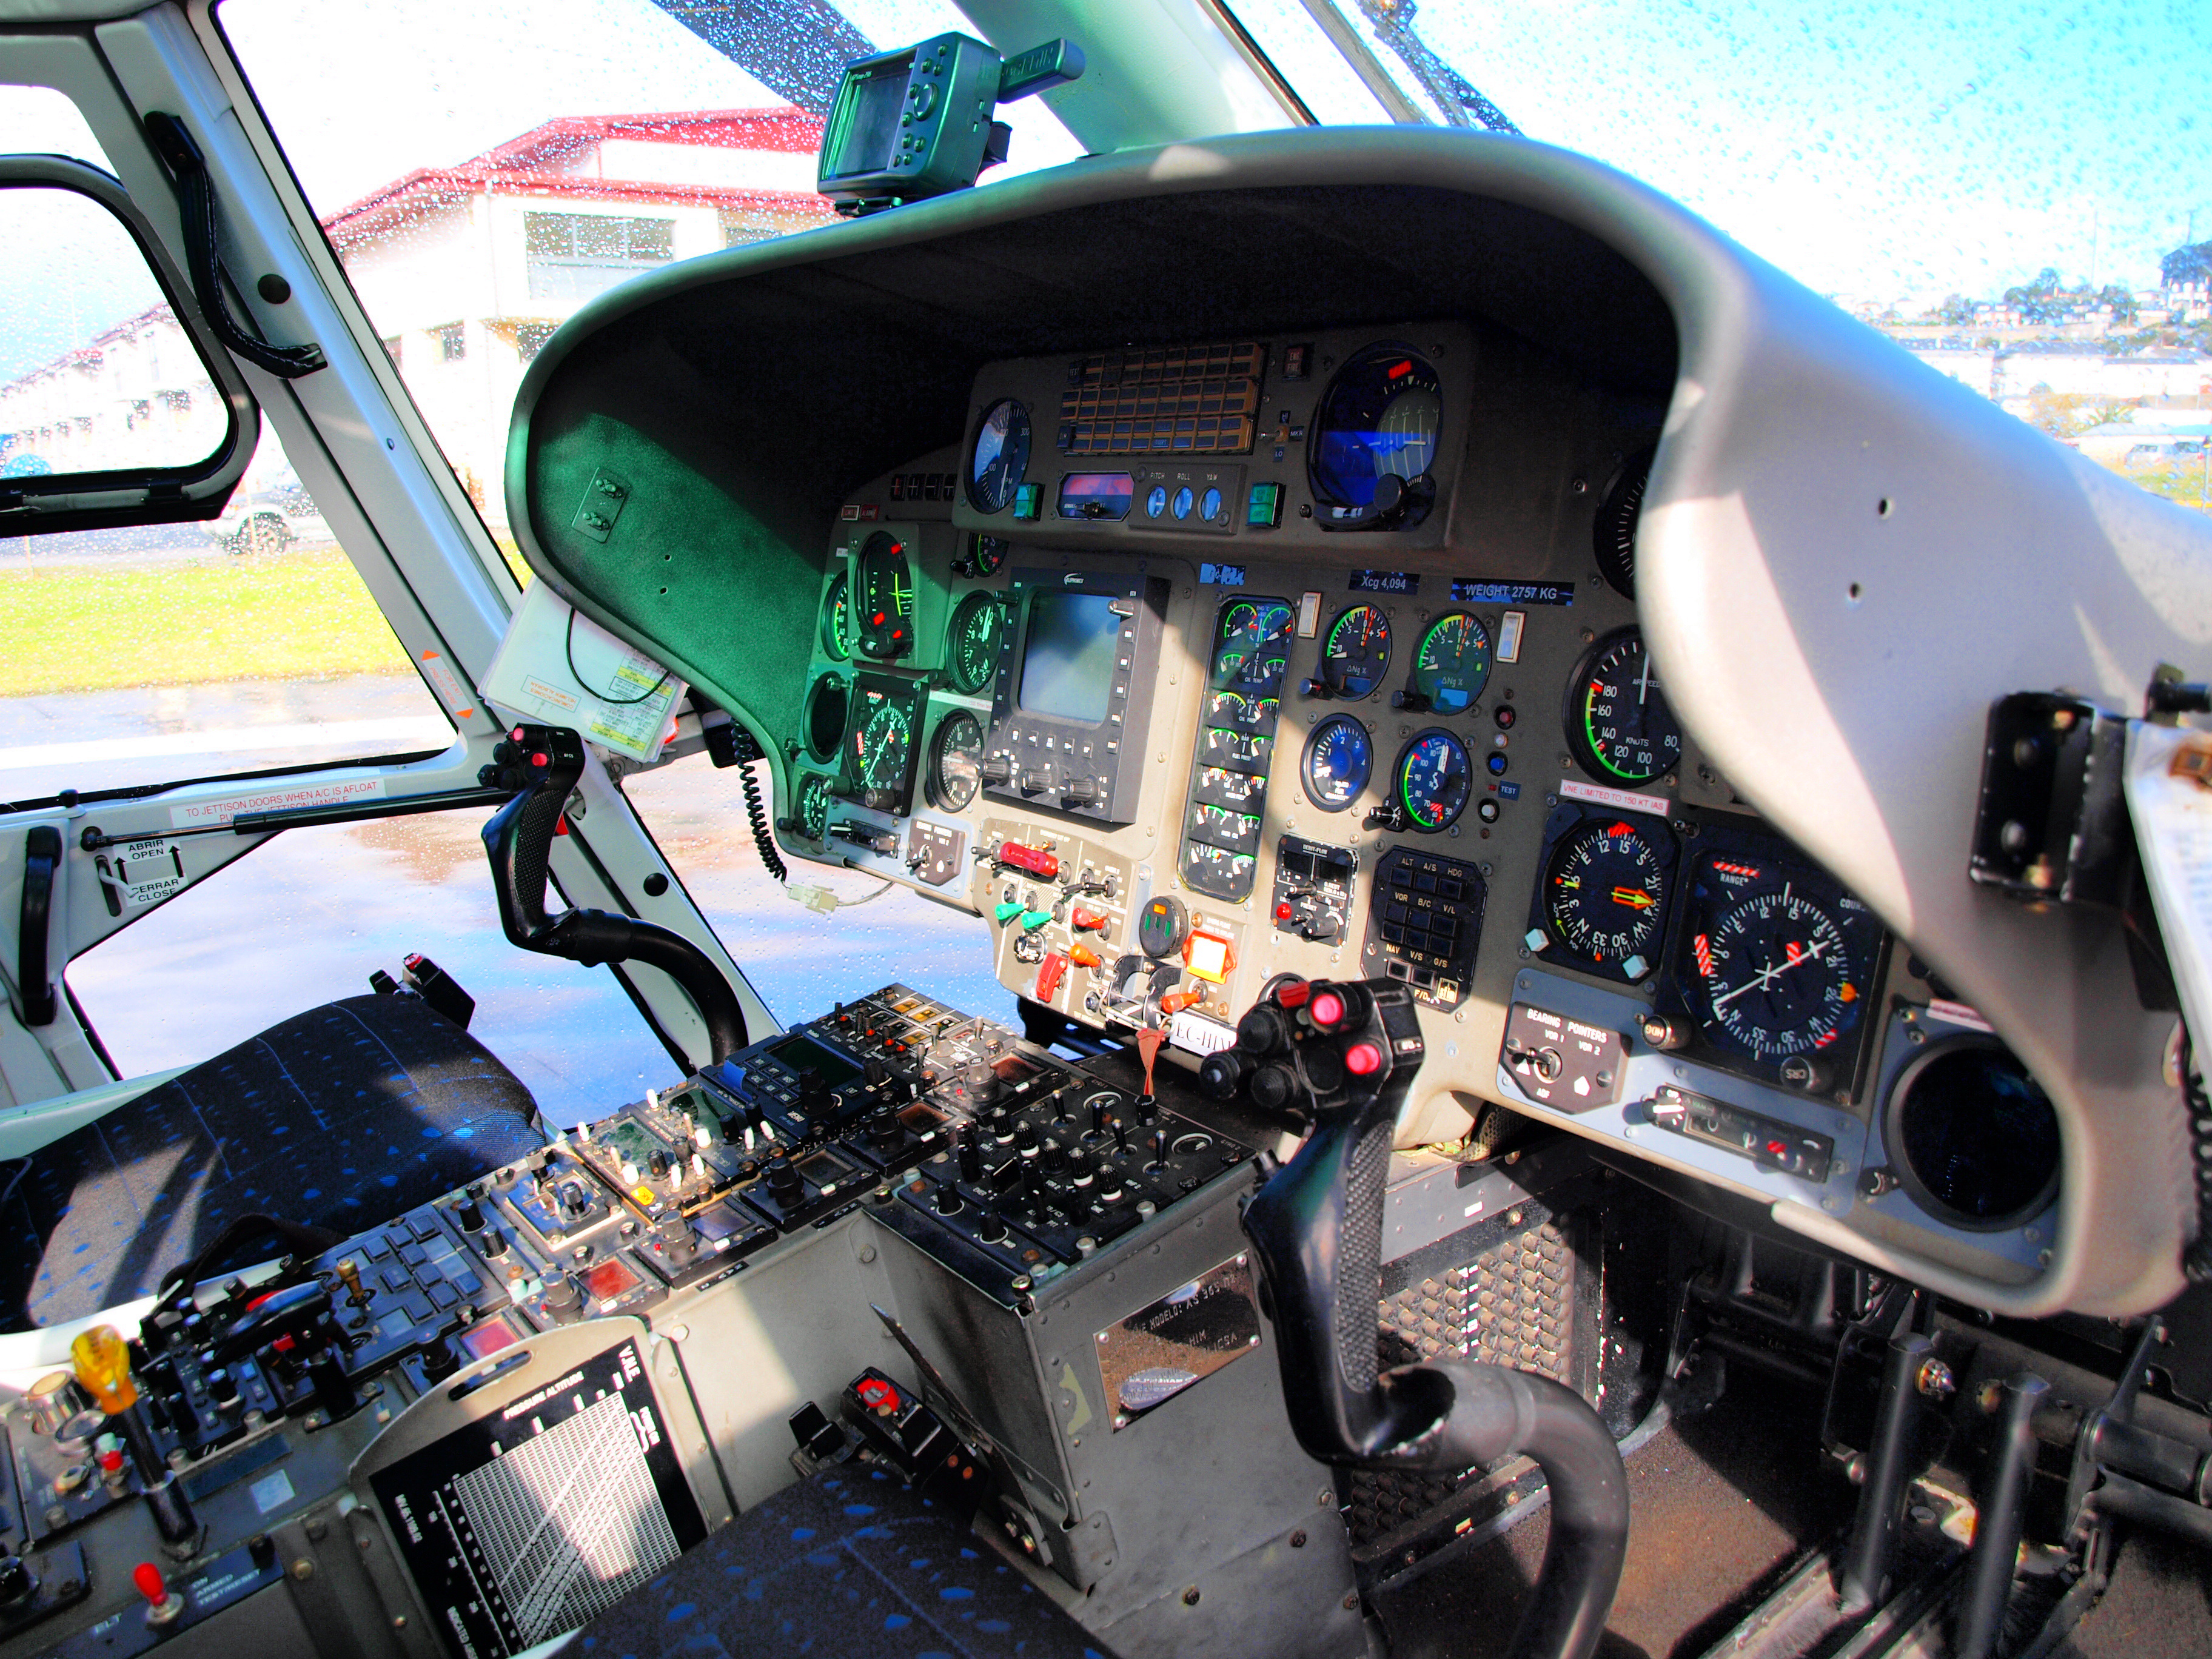 La Cabina Meaning : File:cabina del eurocopter dauphin ec him @ lepv 5359451993 .jpg